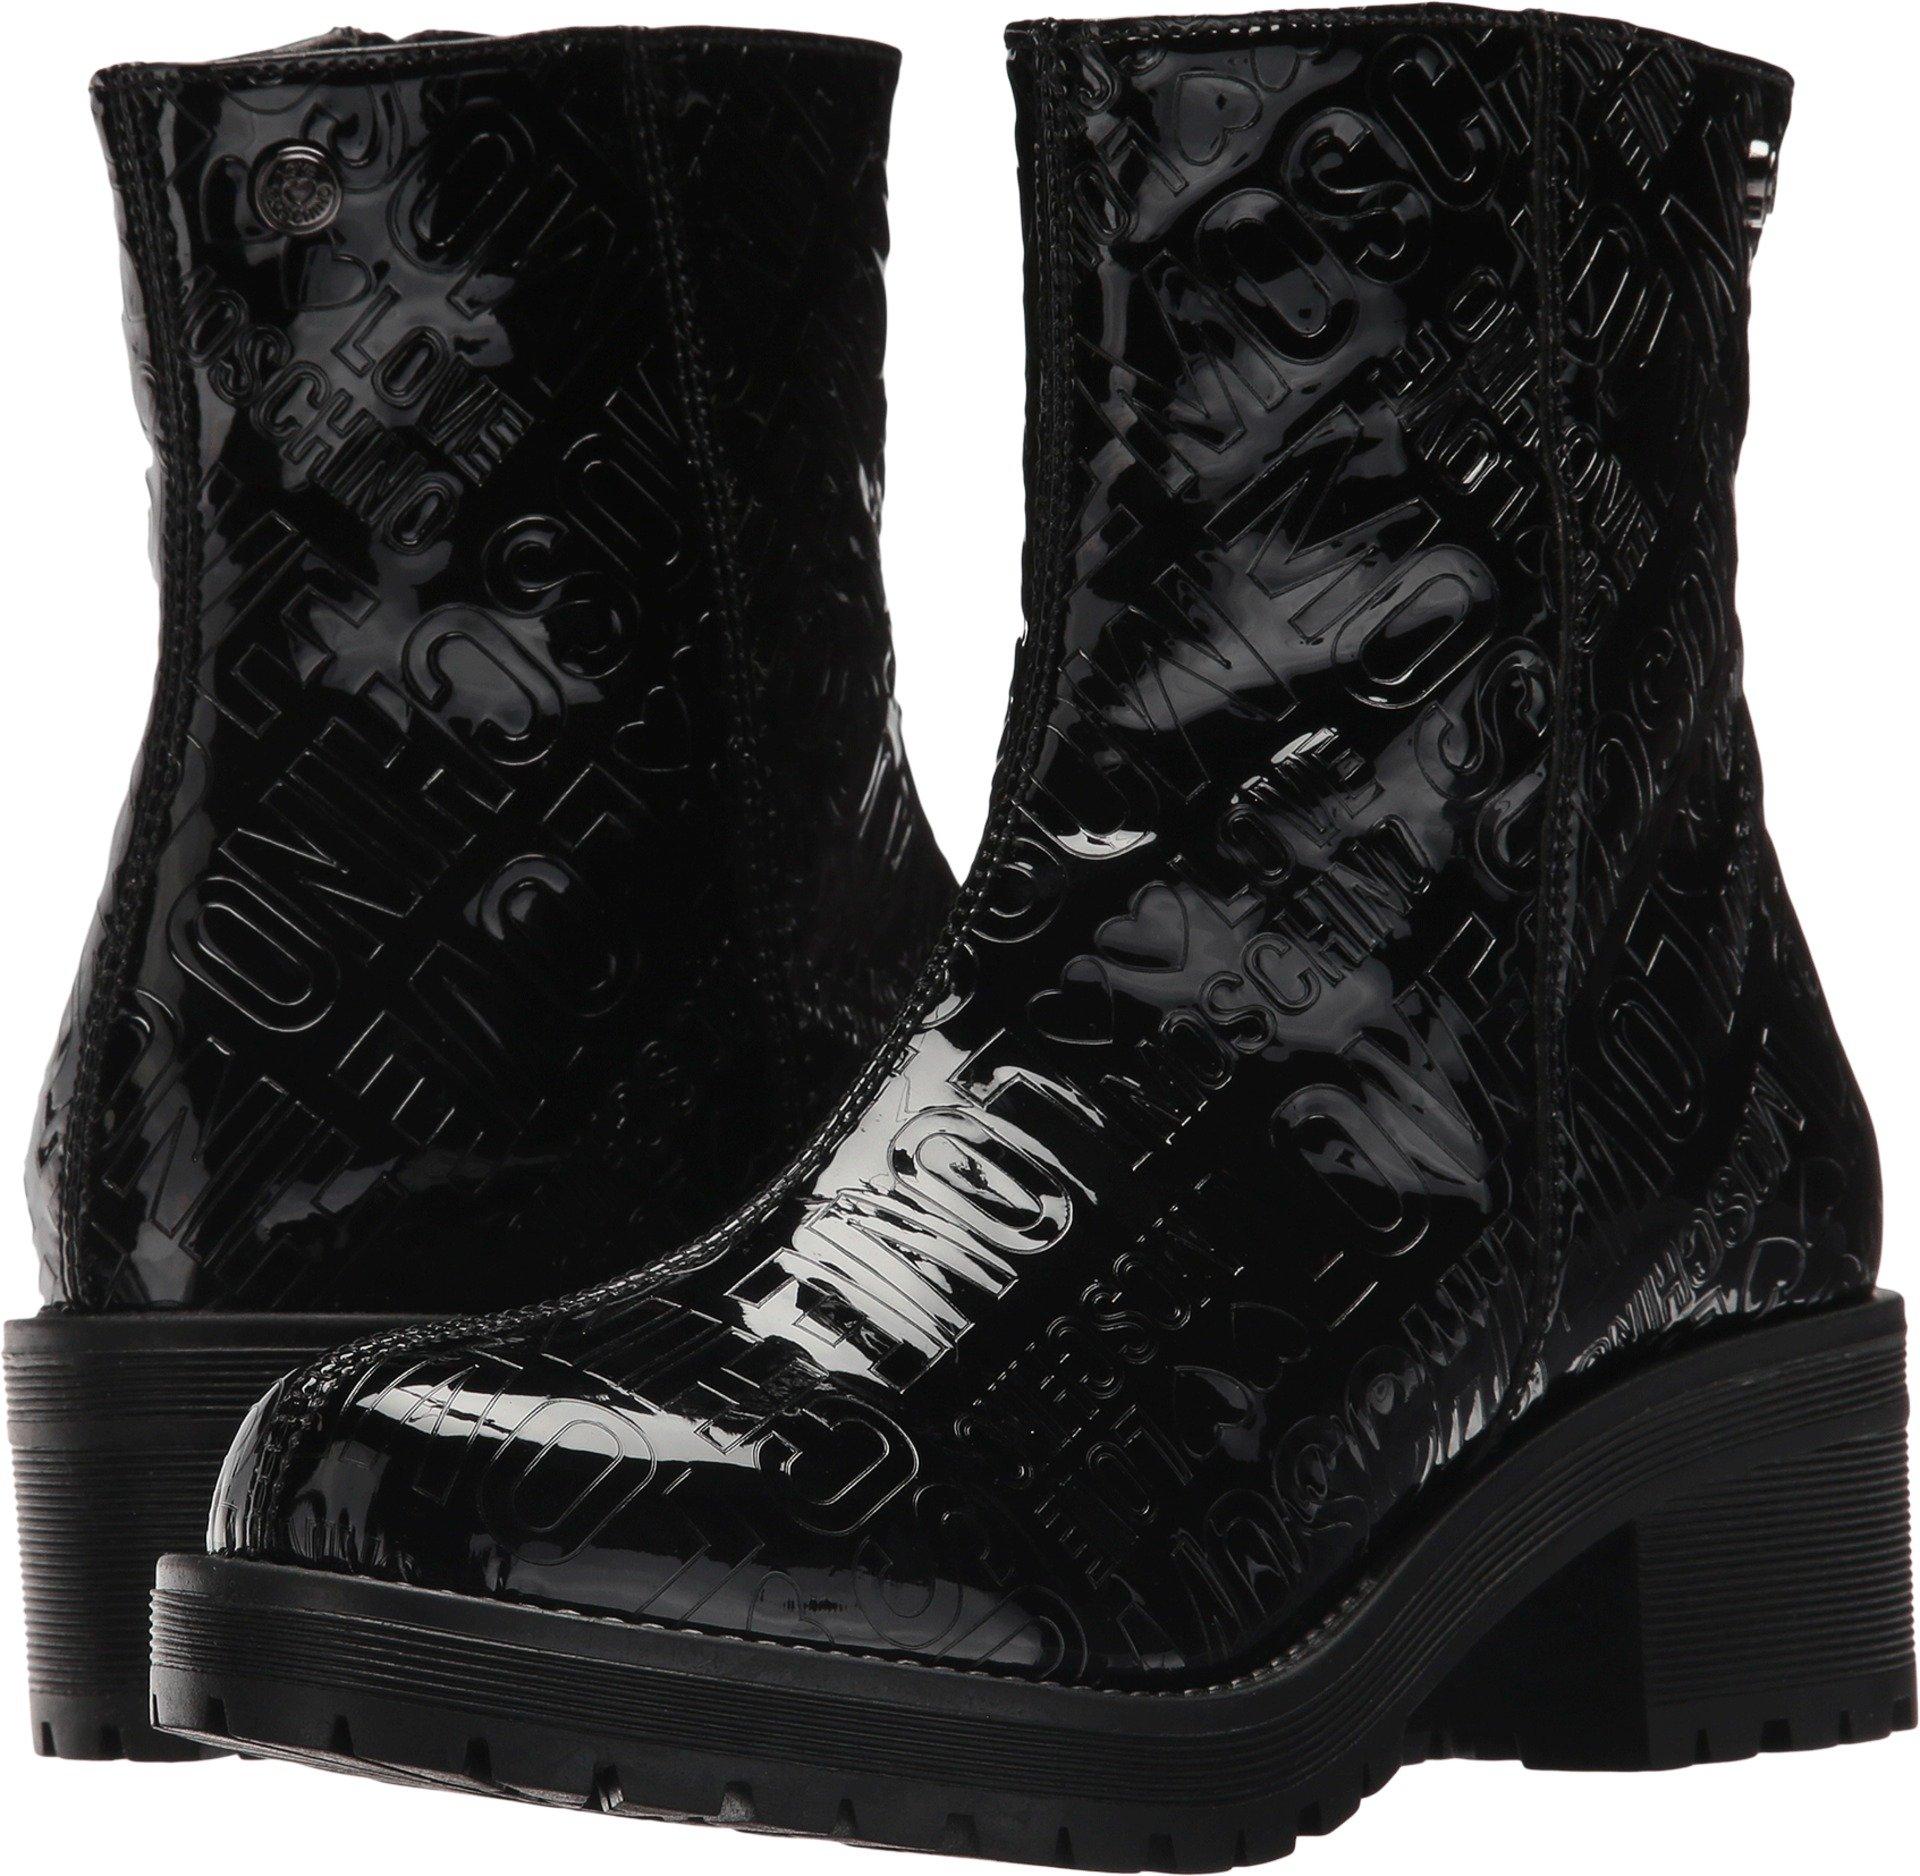 LOVE Moschino Women's Short Rain Boots Black 38 M EU